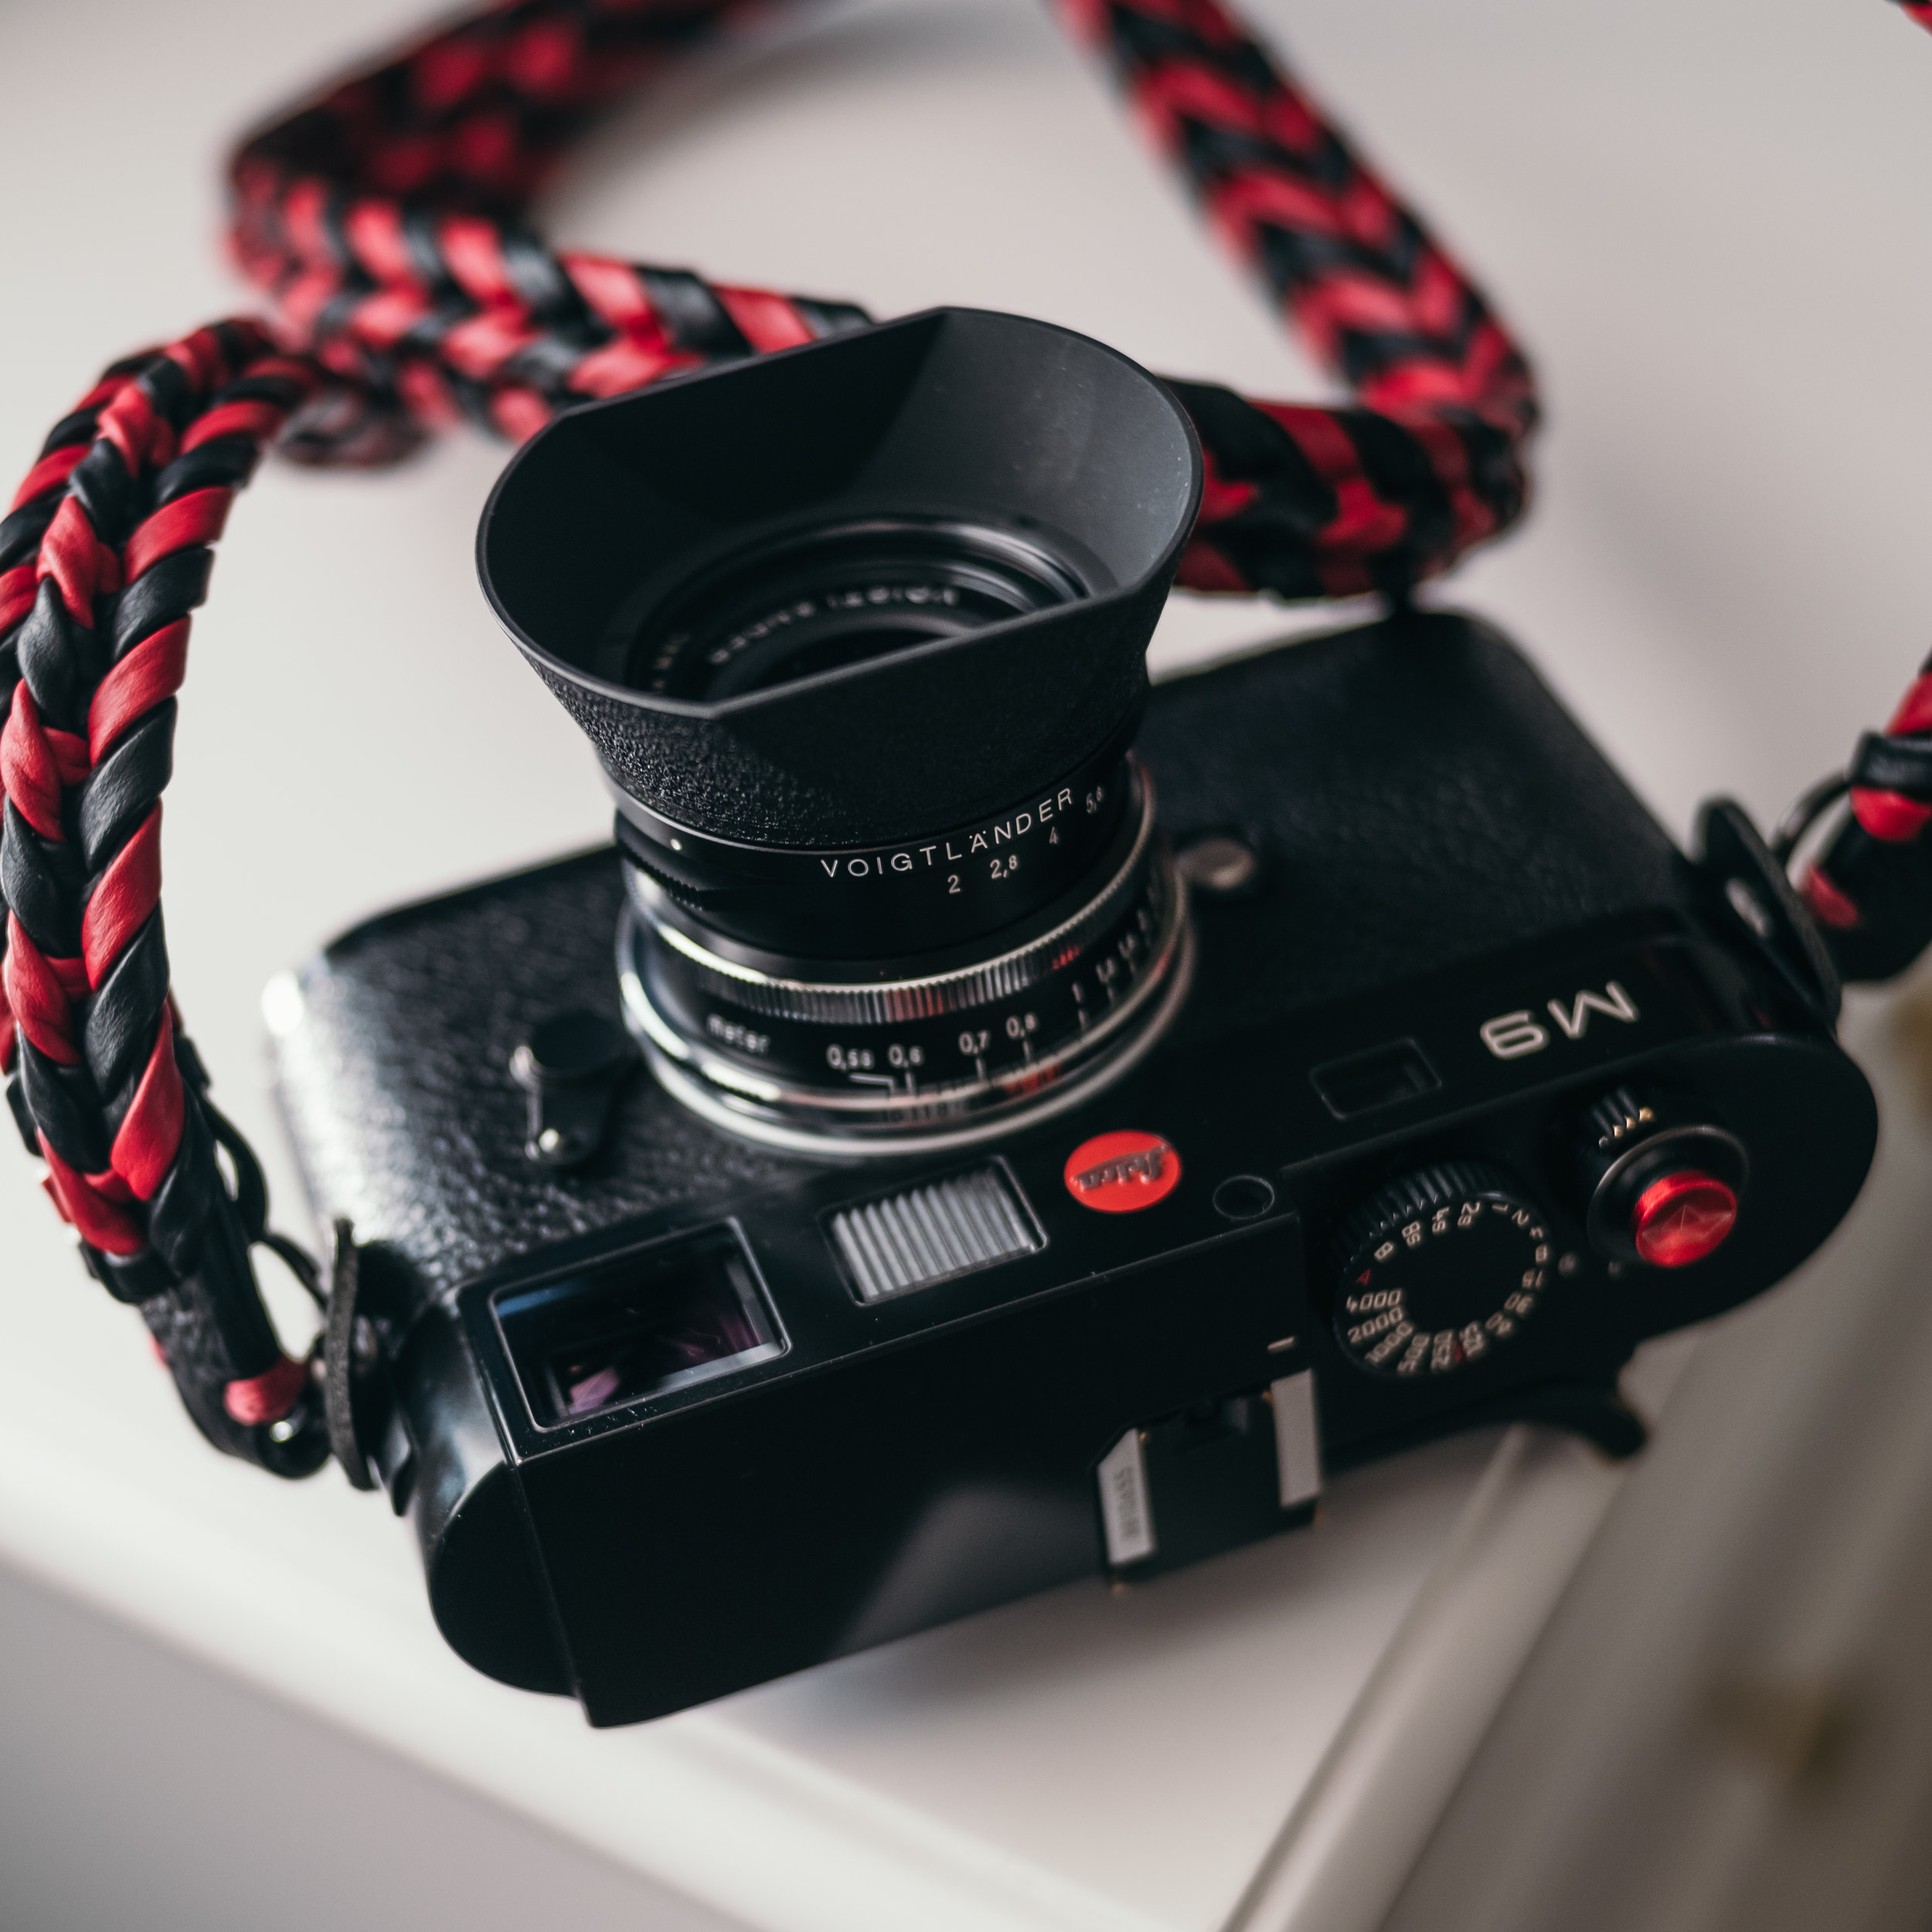 Ultron on Leica M9 with Vi-Vante Ultimate Phoenix strap